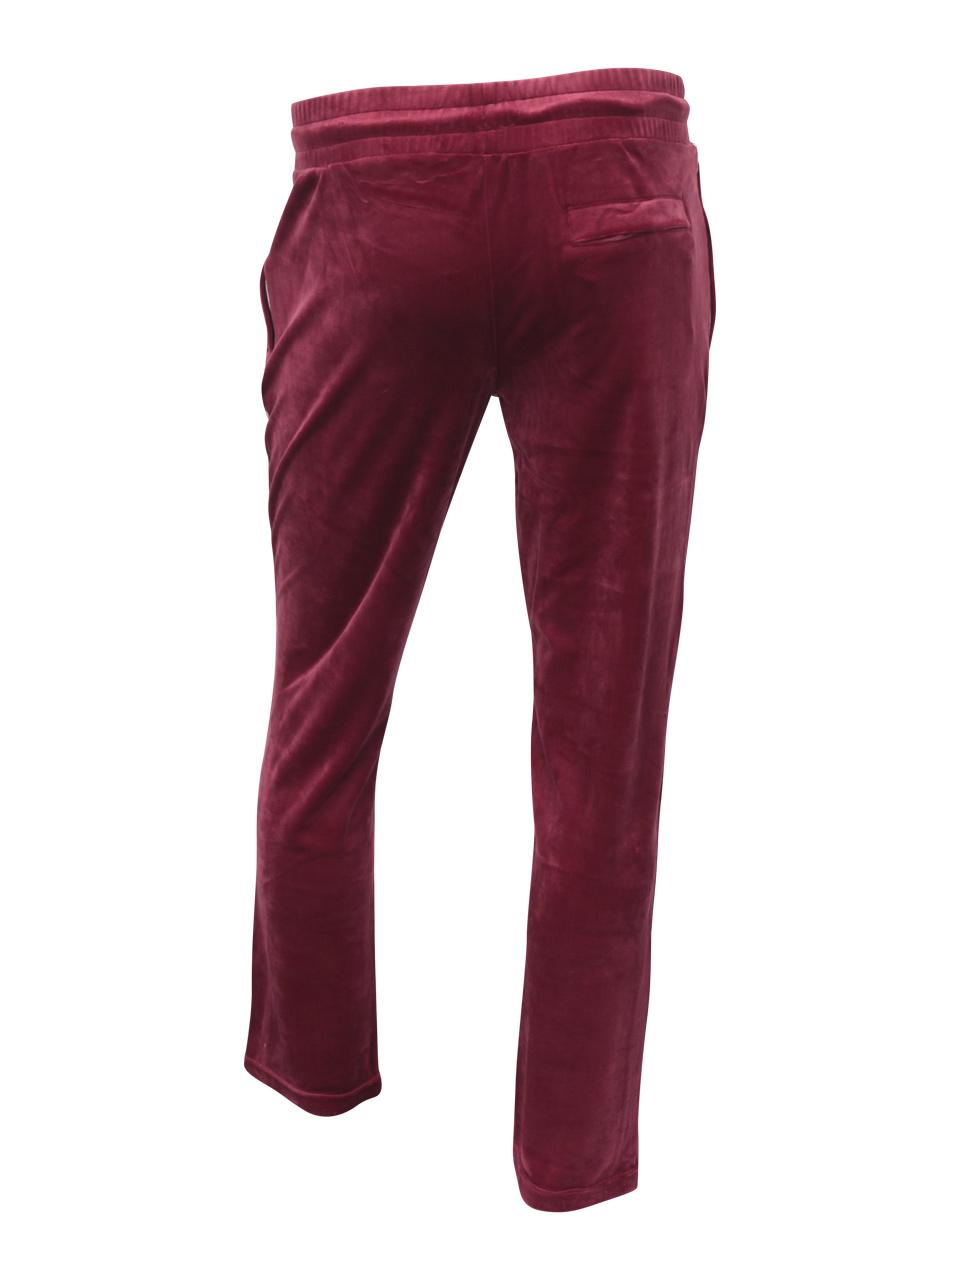 c8a0111ebca Fila Men's Cyrus Velour Track Pants